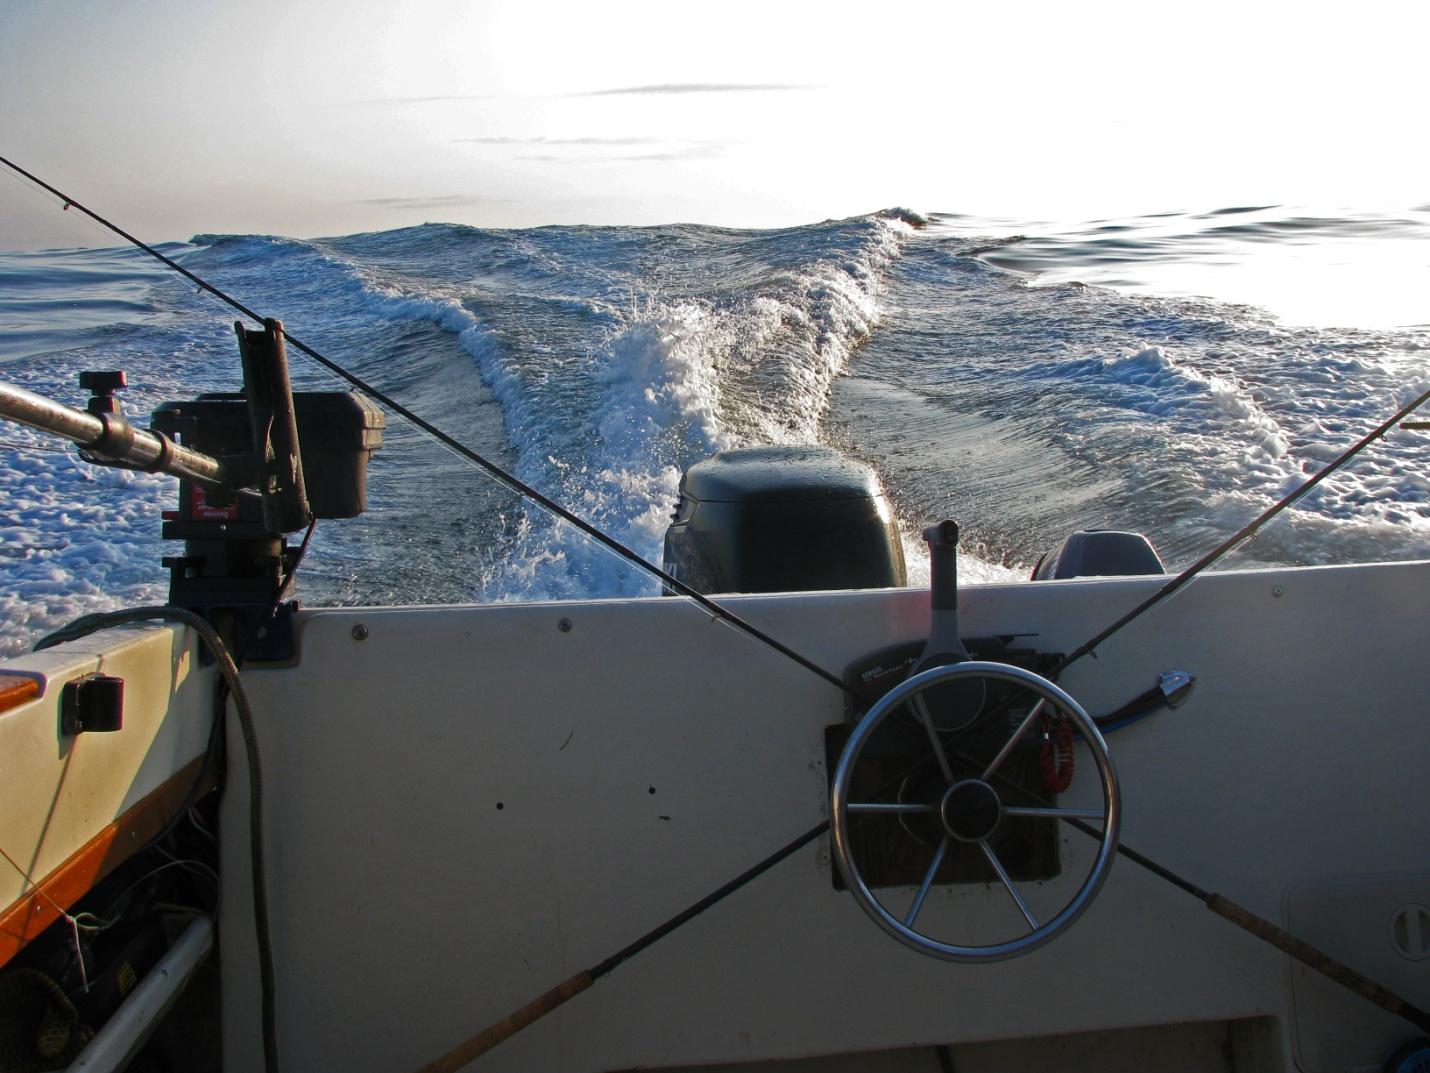 C:\Users\Russ\Desktop\Fishing\Fishing 036.jpg